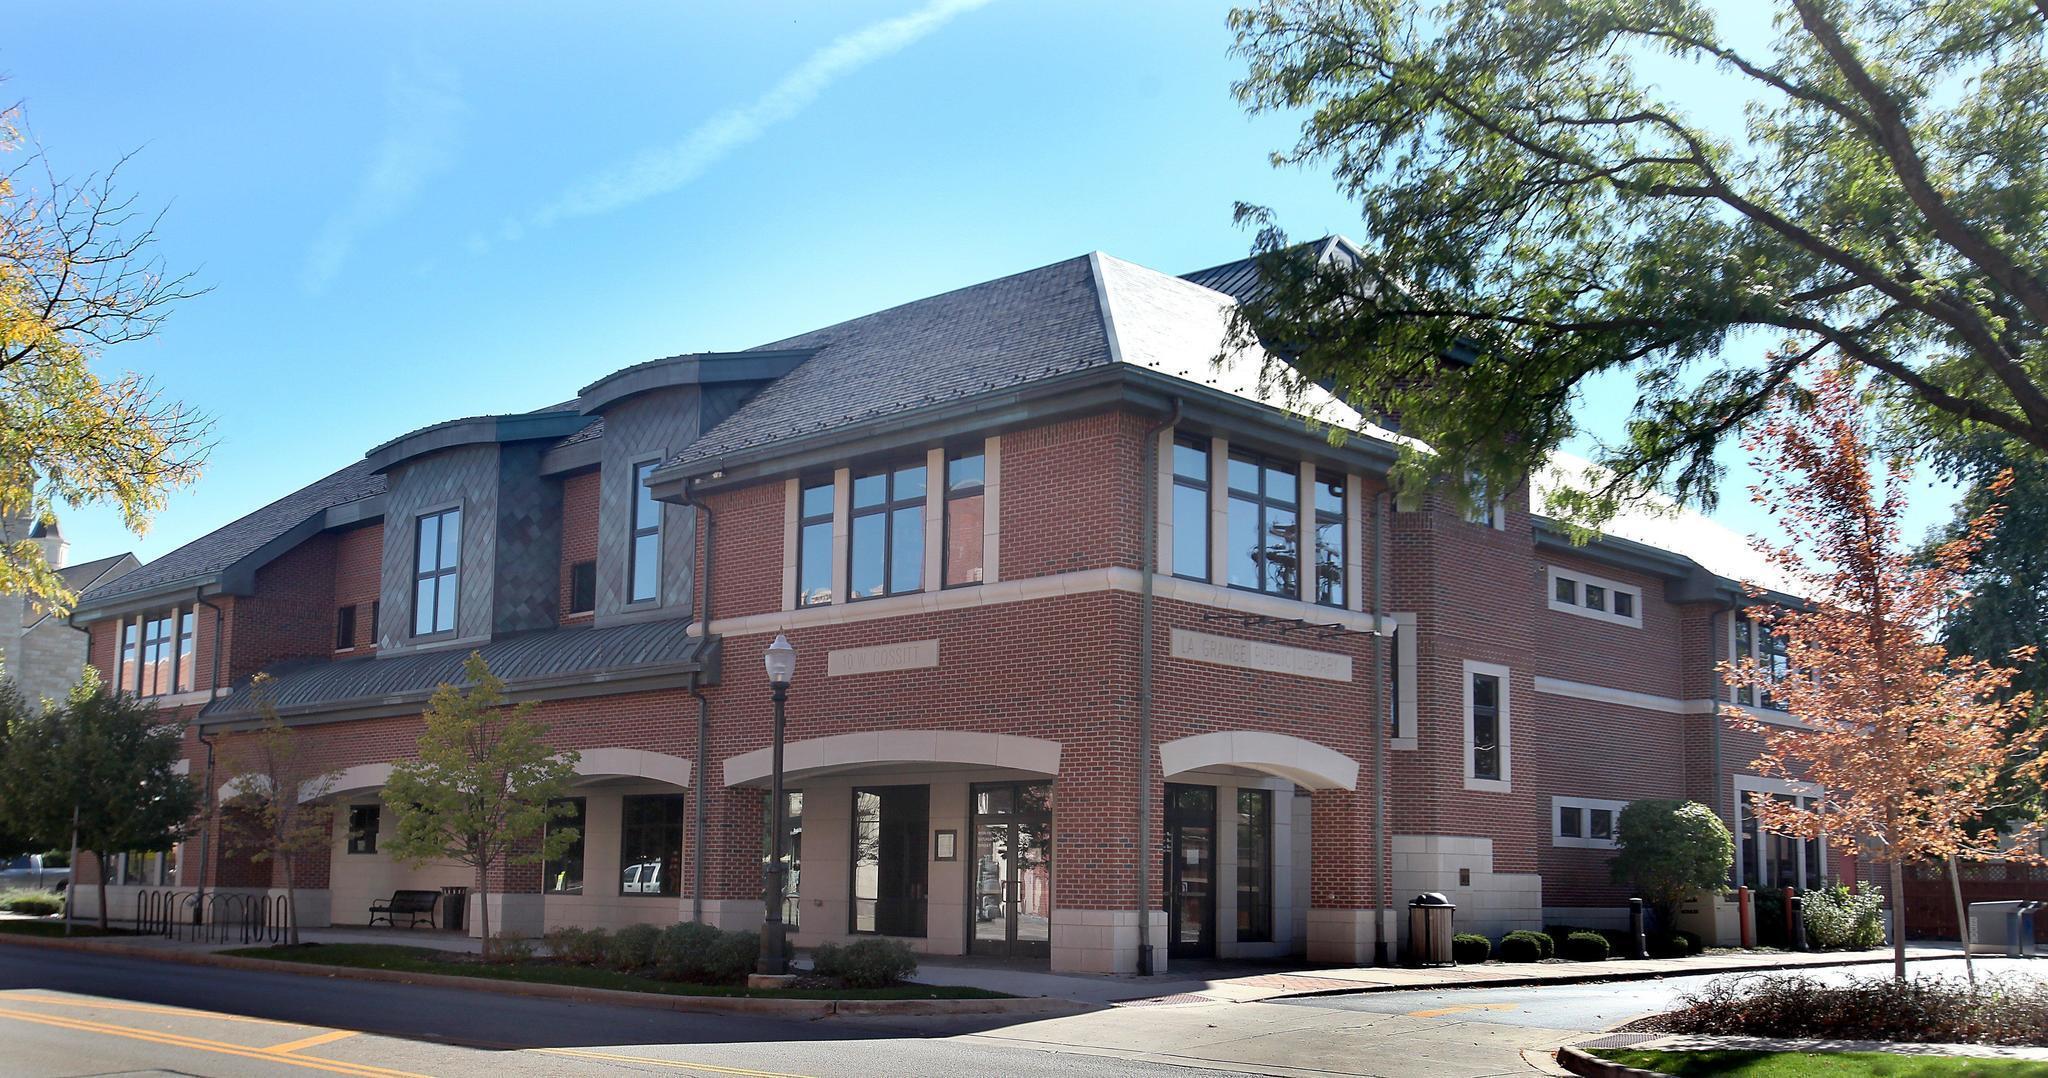 La grange library plans first floor renovation this fall for Renovation grange